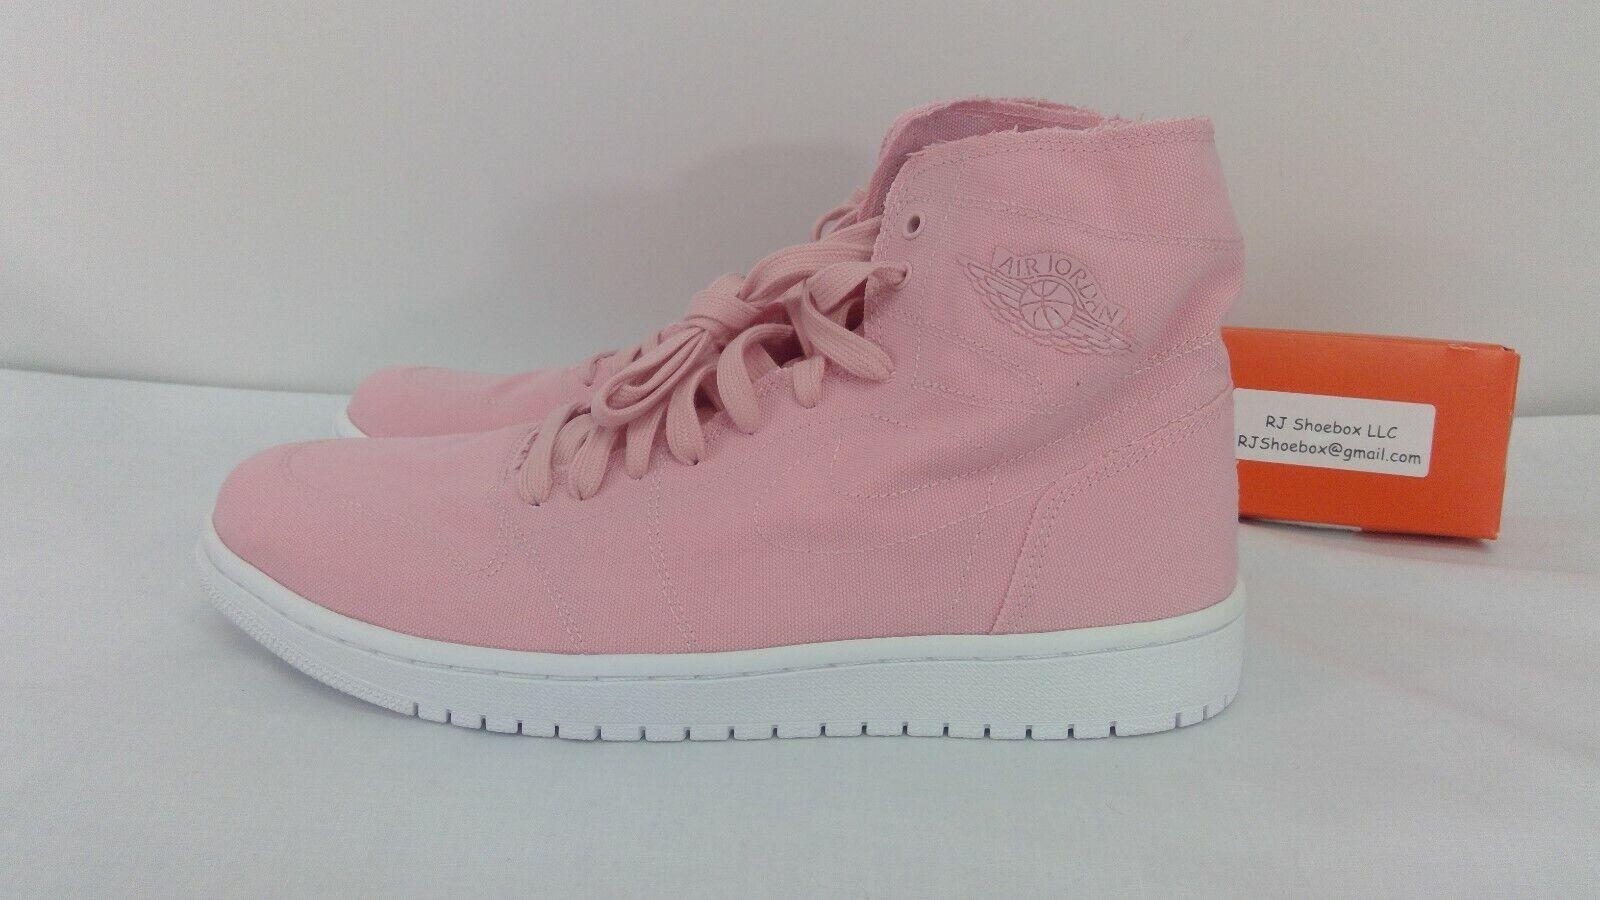 Nike Air Jordan 1 Retro High Decon Pink BNIB 867338-620 Mens Size 10.5